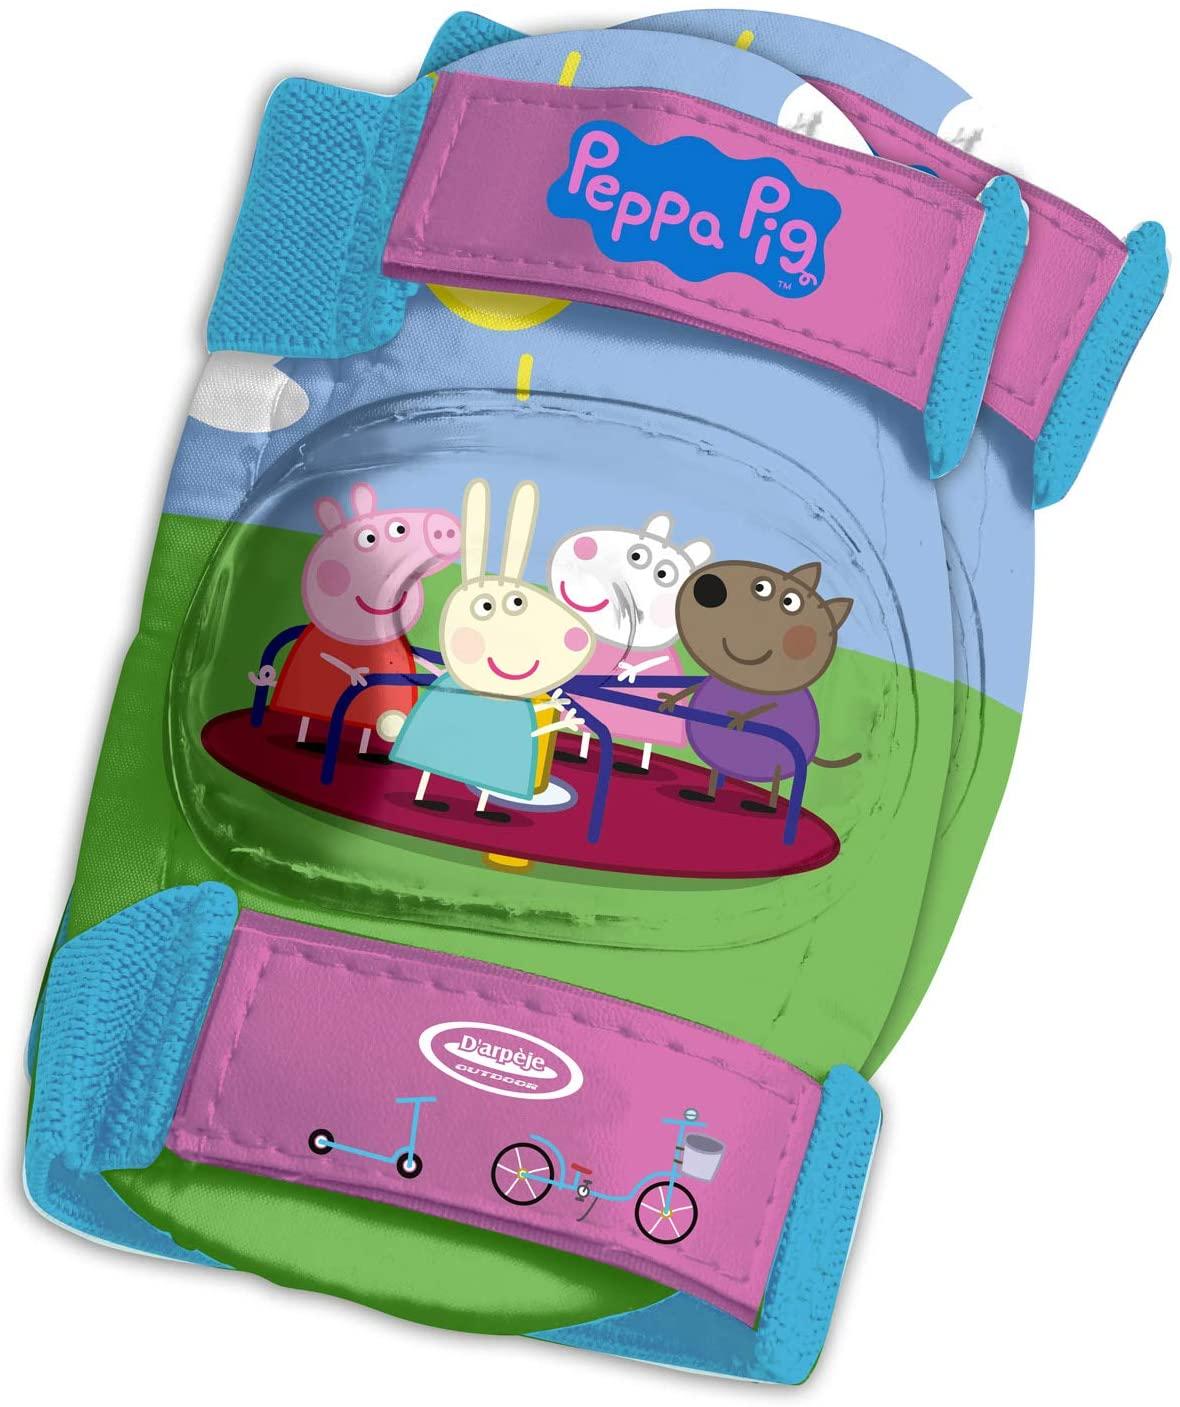 PEPPA PIG PROTECCIONES, CASCO Y MOCHILA OPEP004 - N27120